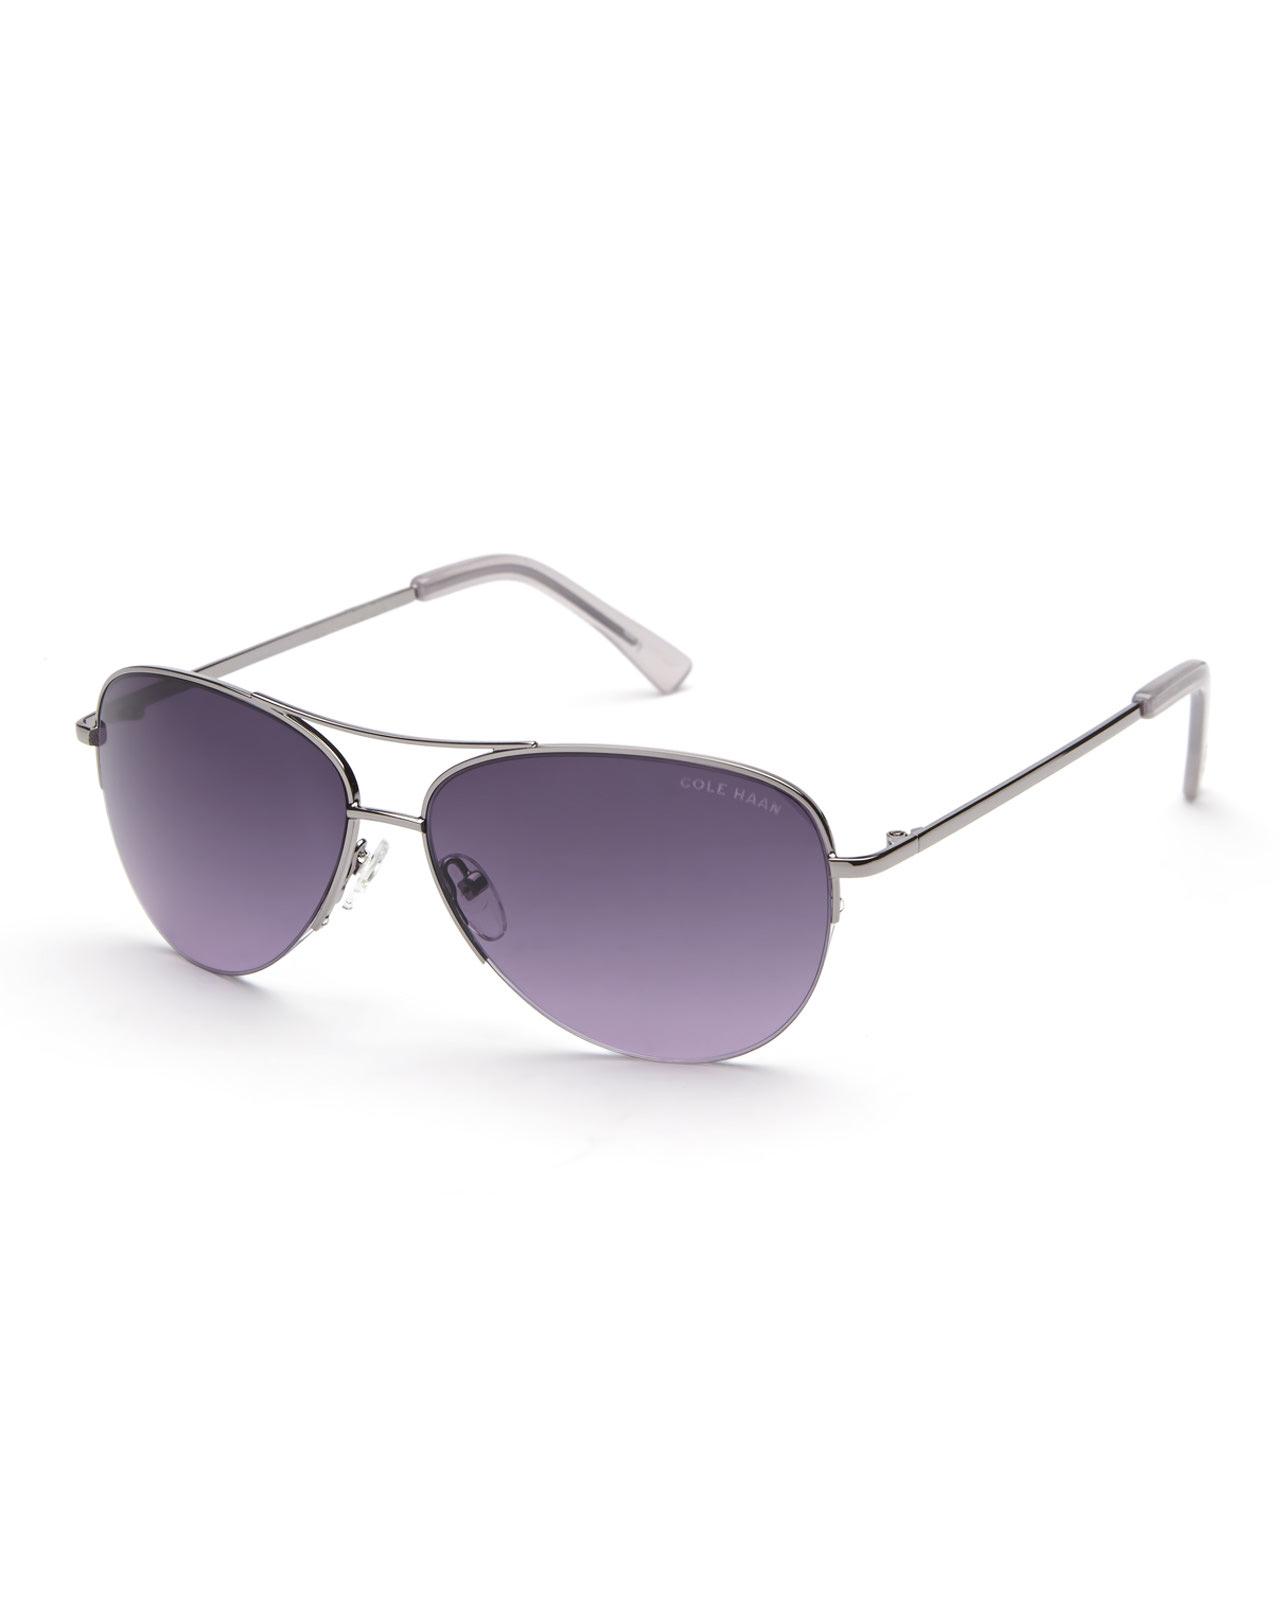 378885bbb1 Lyst - Cole Haan Gunmetal   Purple C6139 Half-Rim Aviator Sunglasses ...